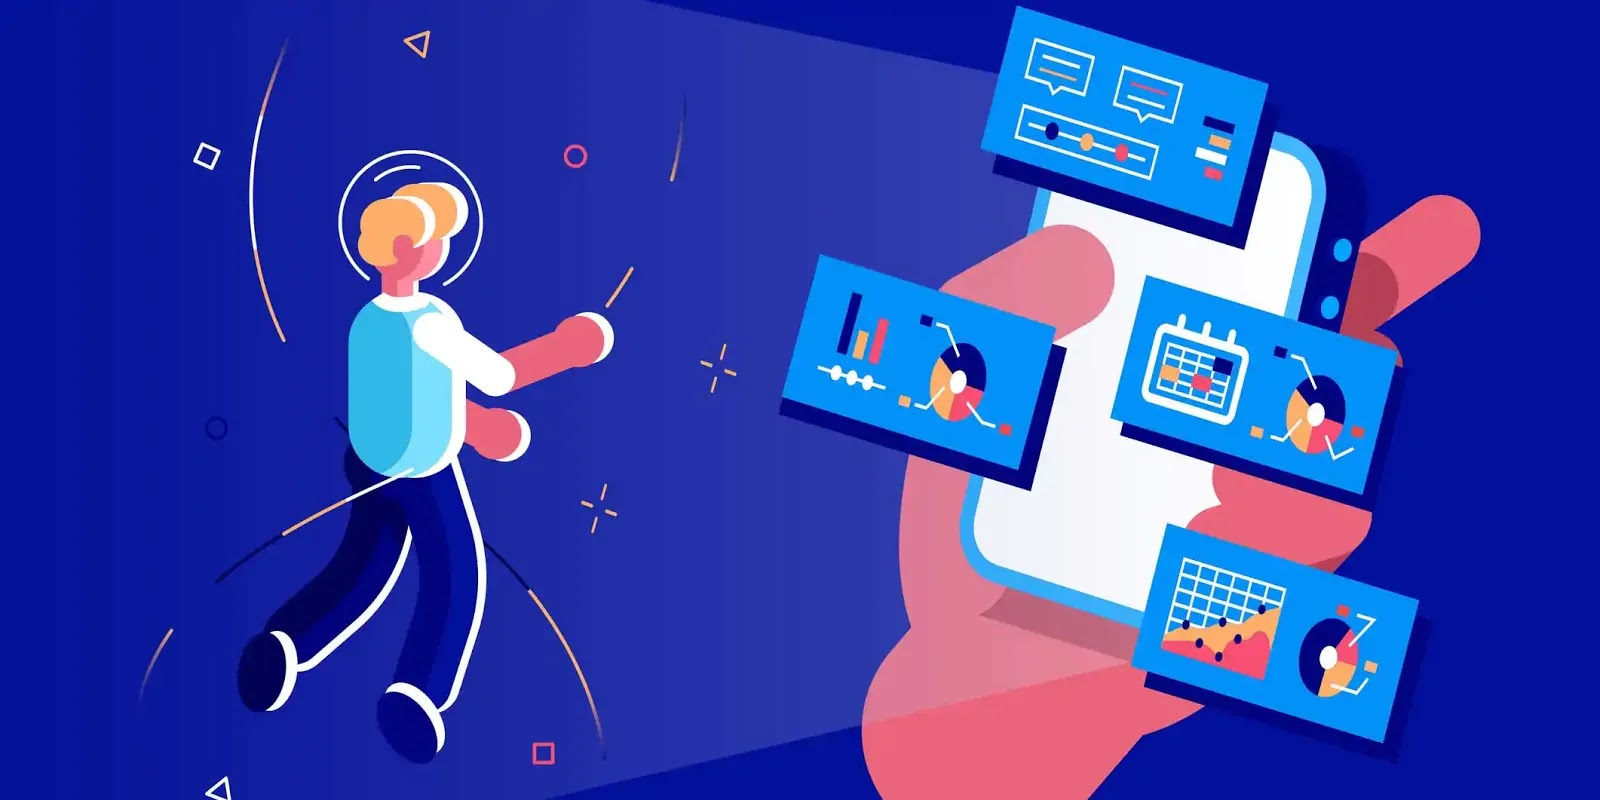 8 خطوات لبناء تطبيق اندرويد ناجح